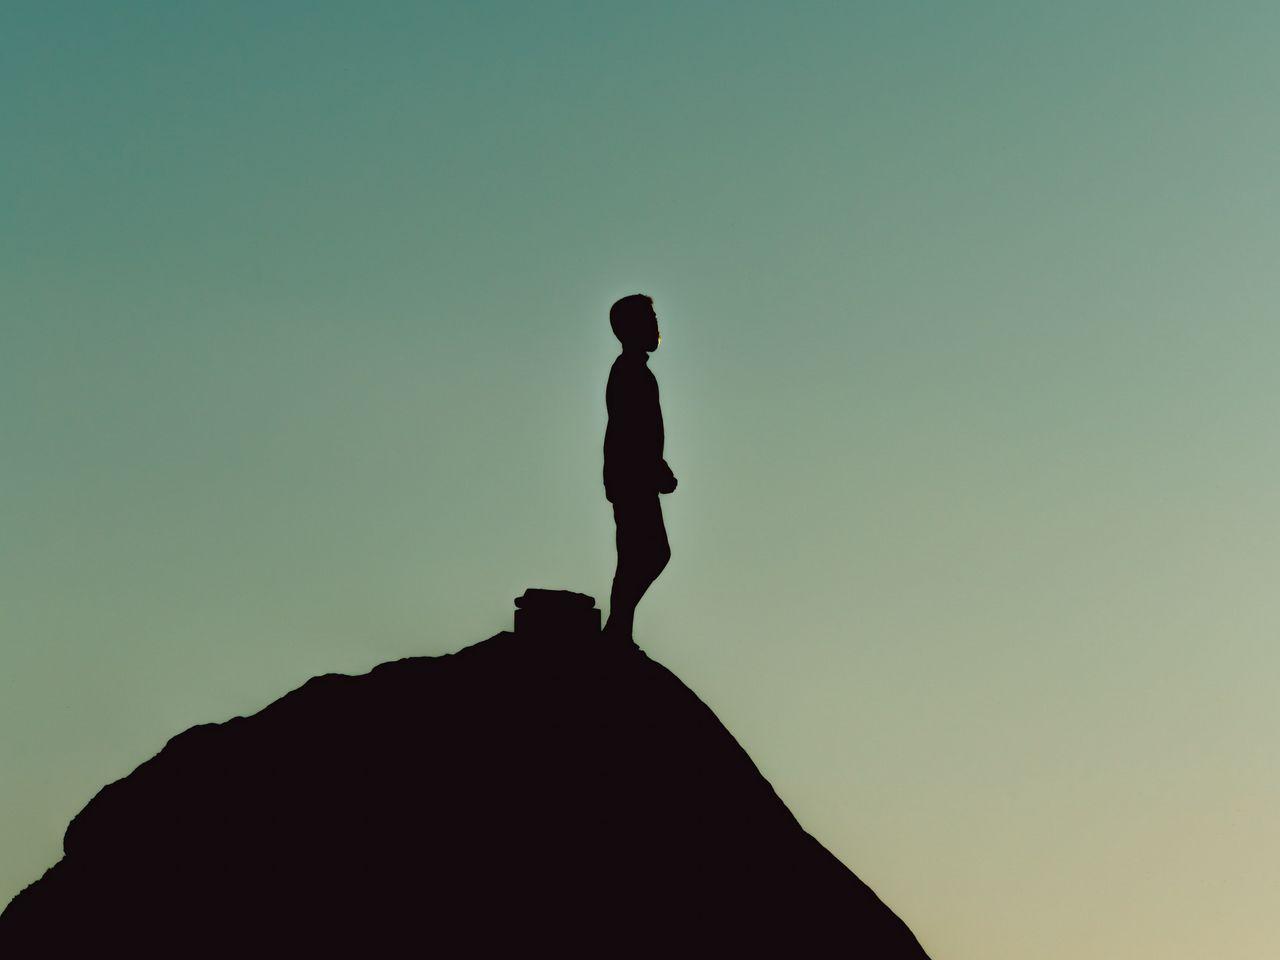 1280x960 Wallpaper silhouette, alone, mountain, twilight, dark